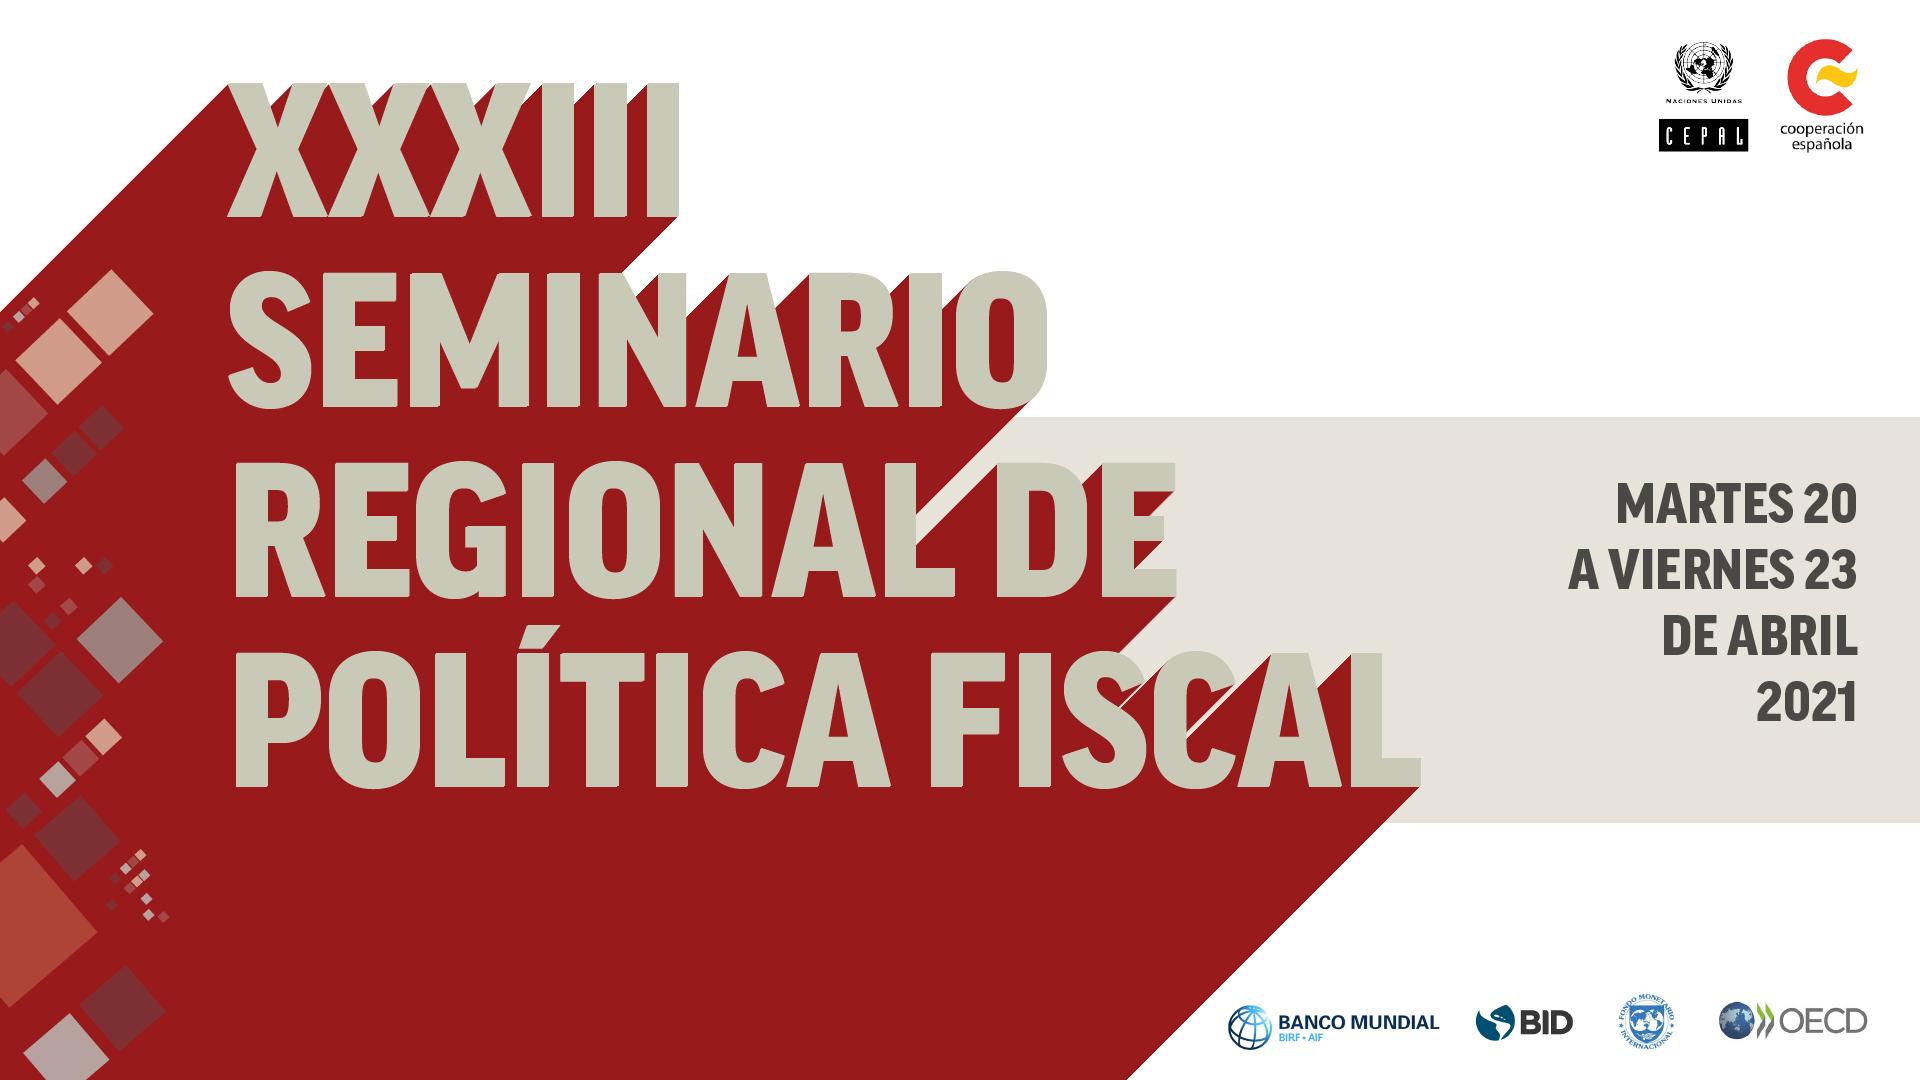 Banner XXXIII Seminario Regional de Política Fiscal